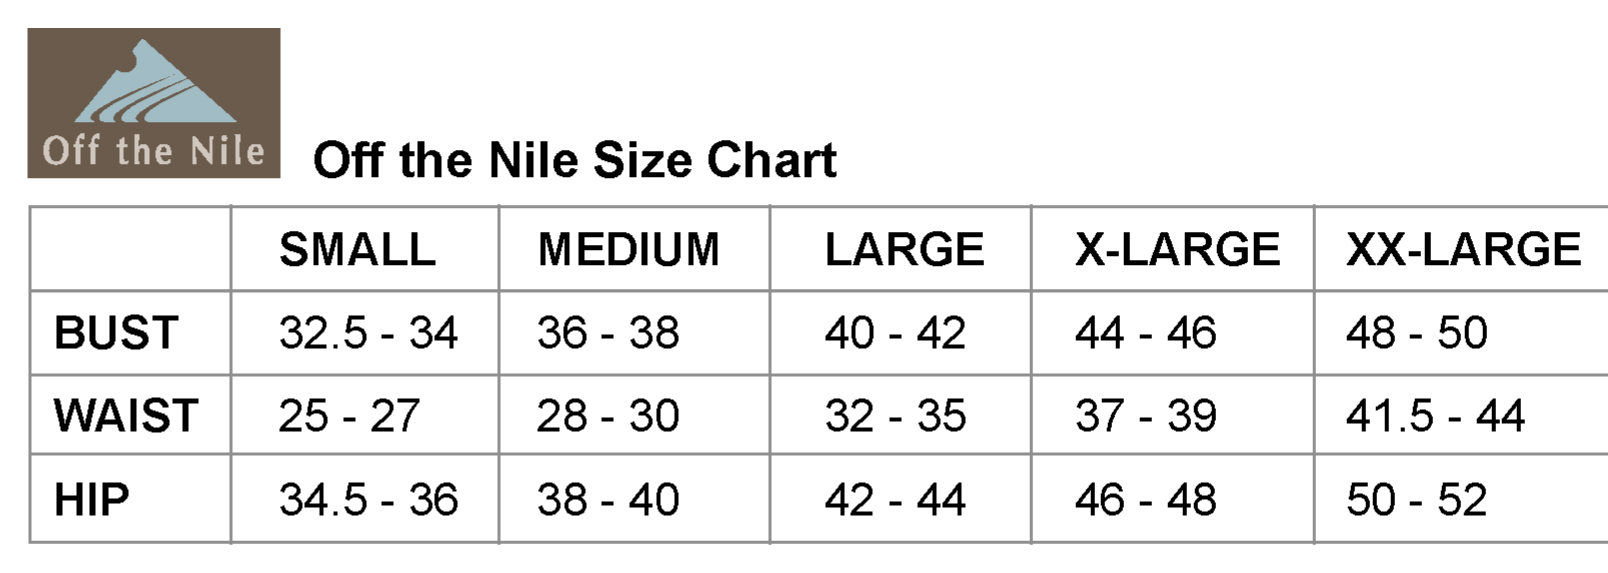 otn-size-chart-s-2x.jpg